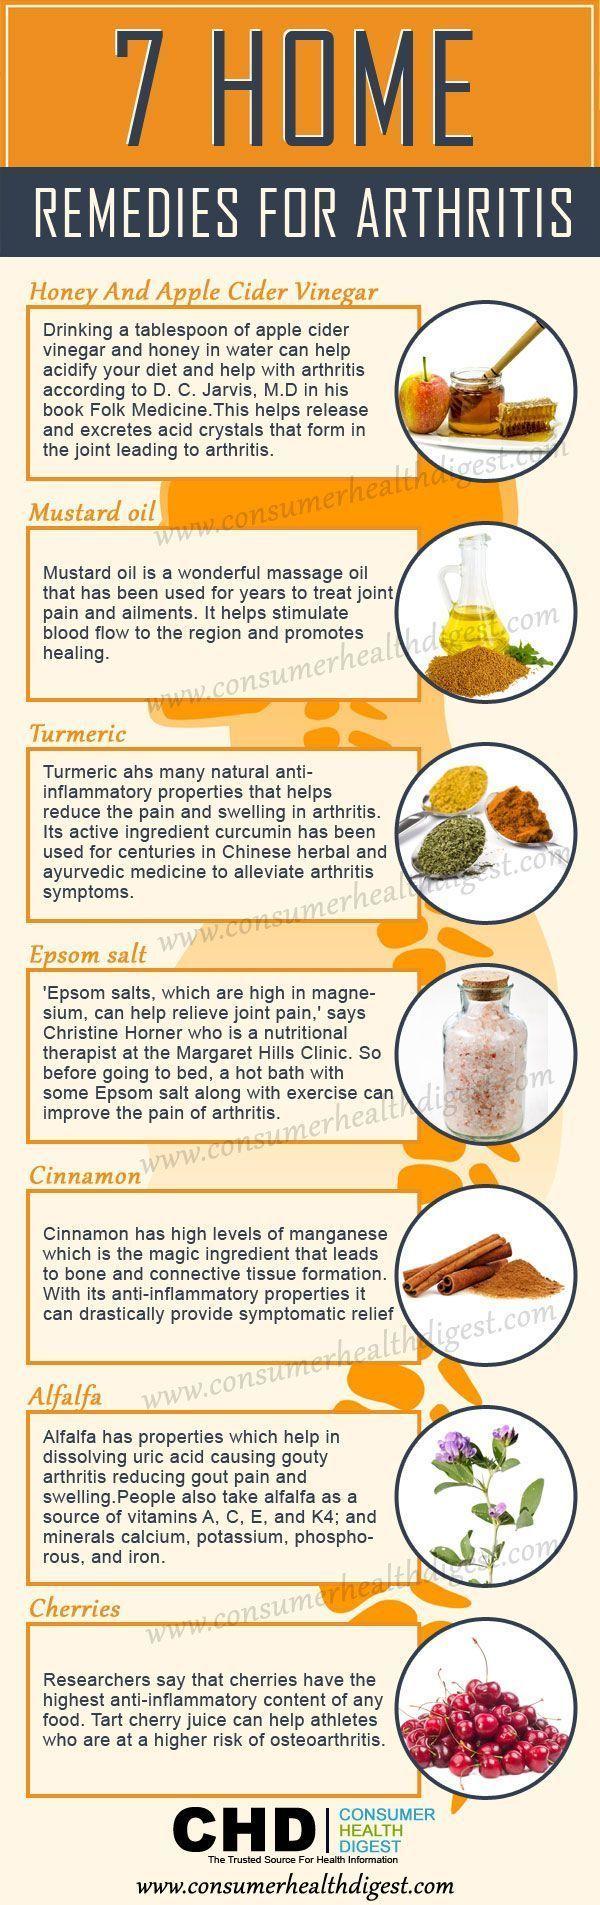 17 Home DIY Remedies for Arthritis